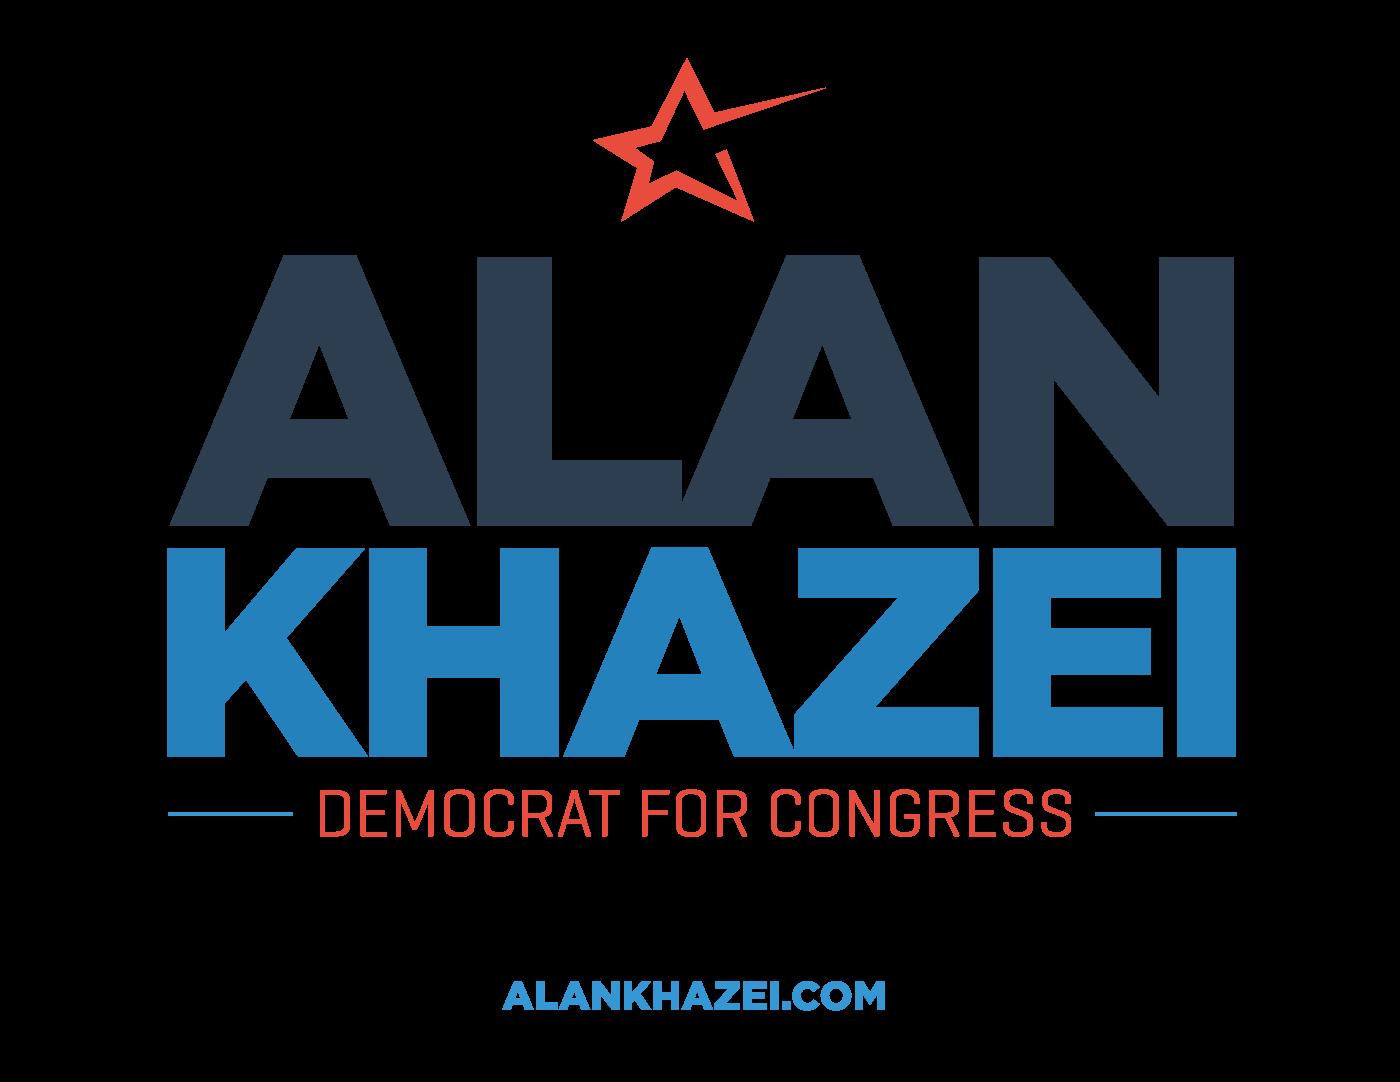 Alan Khazei